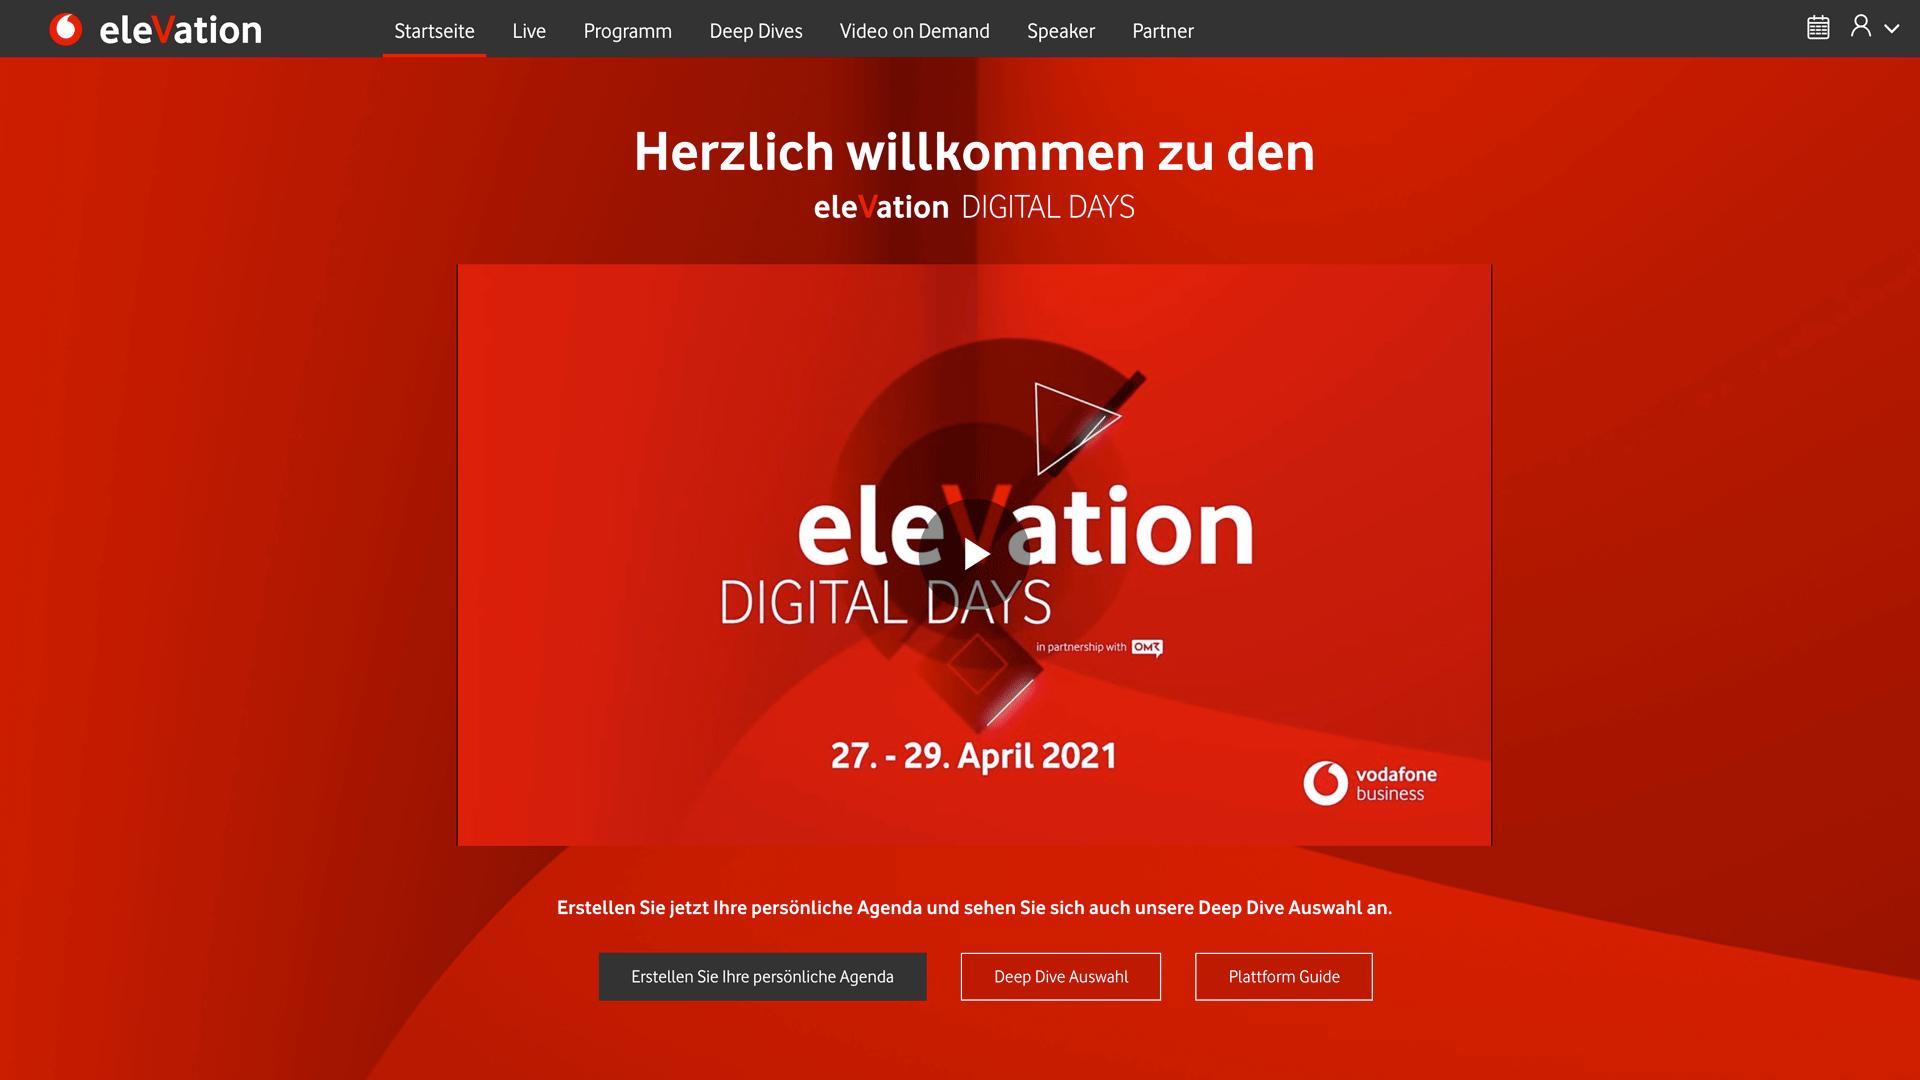 elevation Digital Days 2021